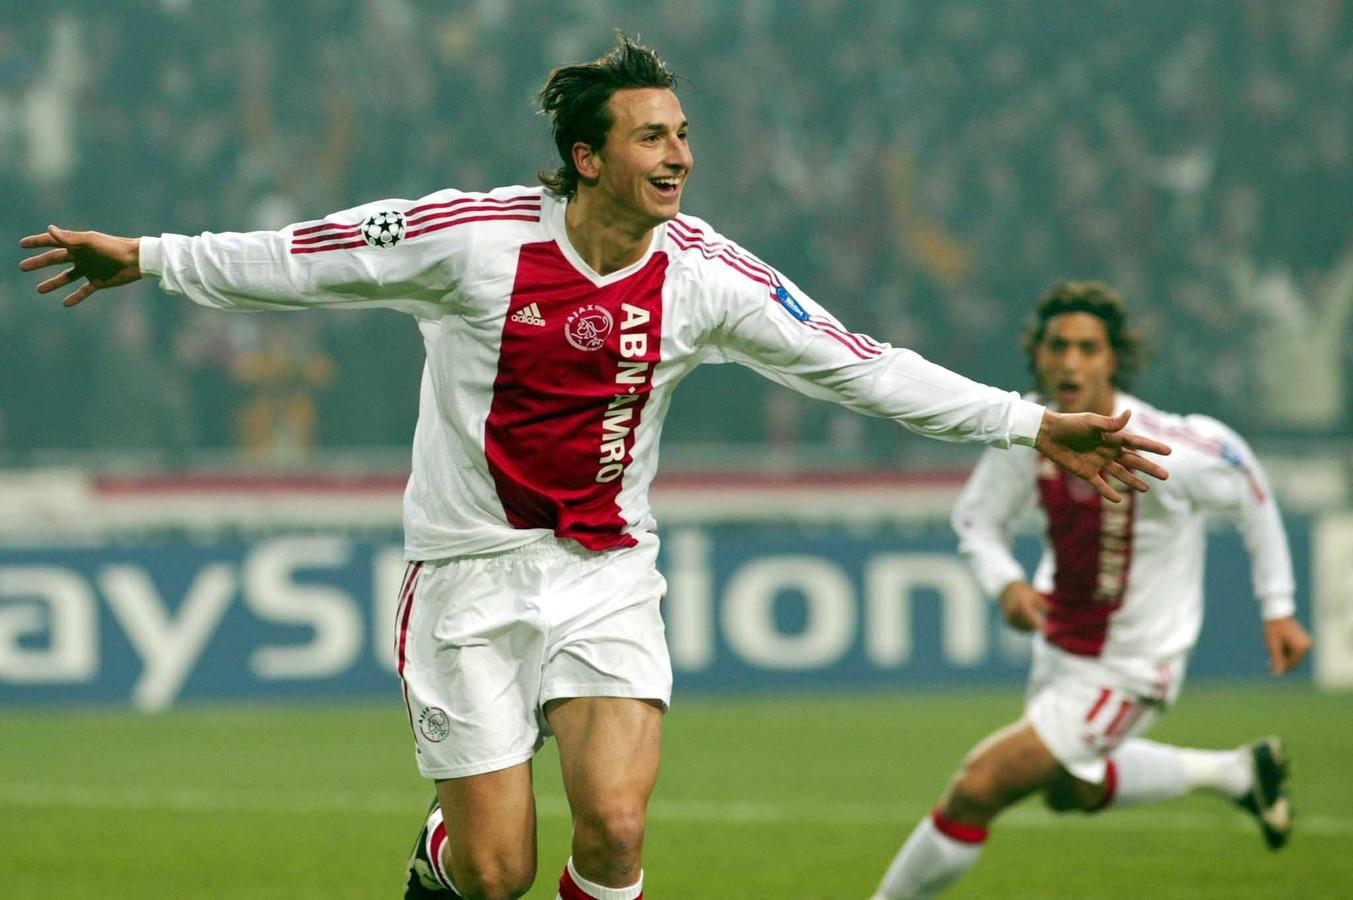 Zlatan Ibrahimovic viert zijn treffer namens Ajax tegen AS Roma, 12 oktober 2002.